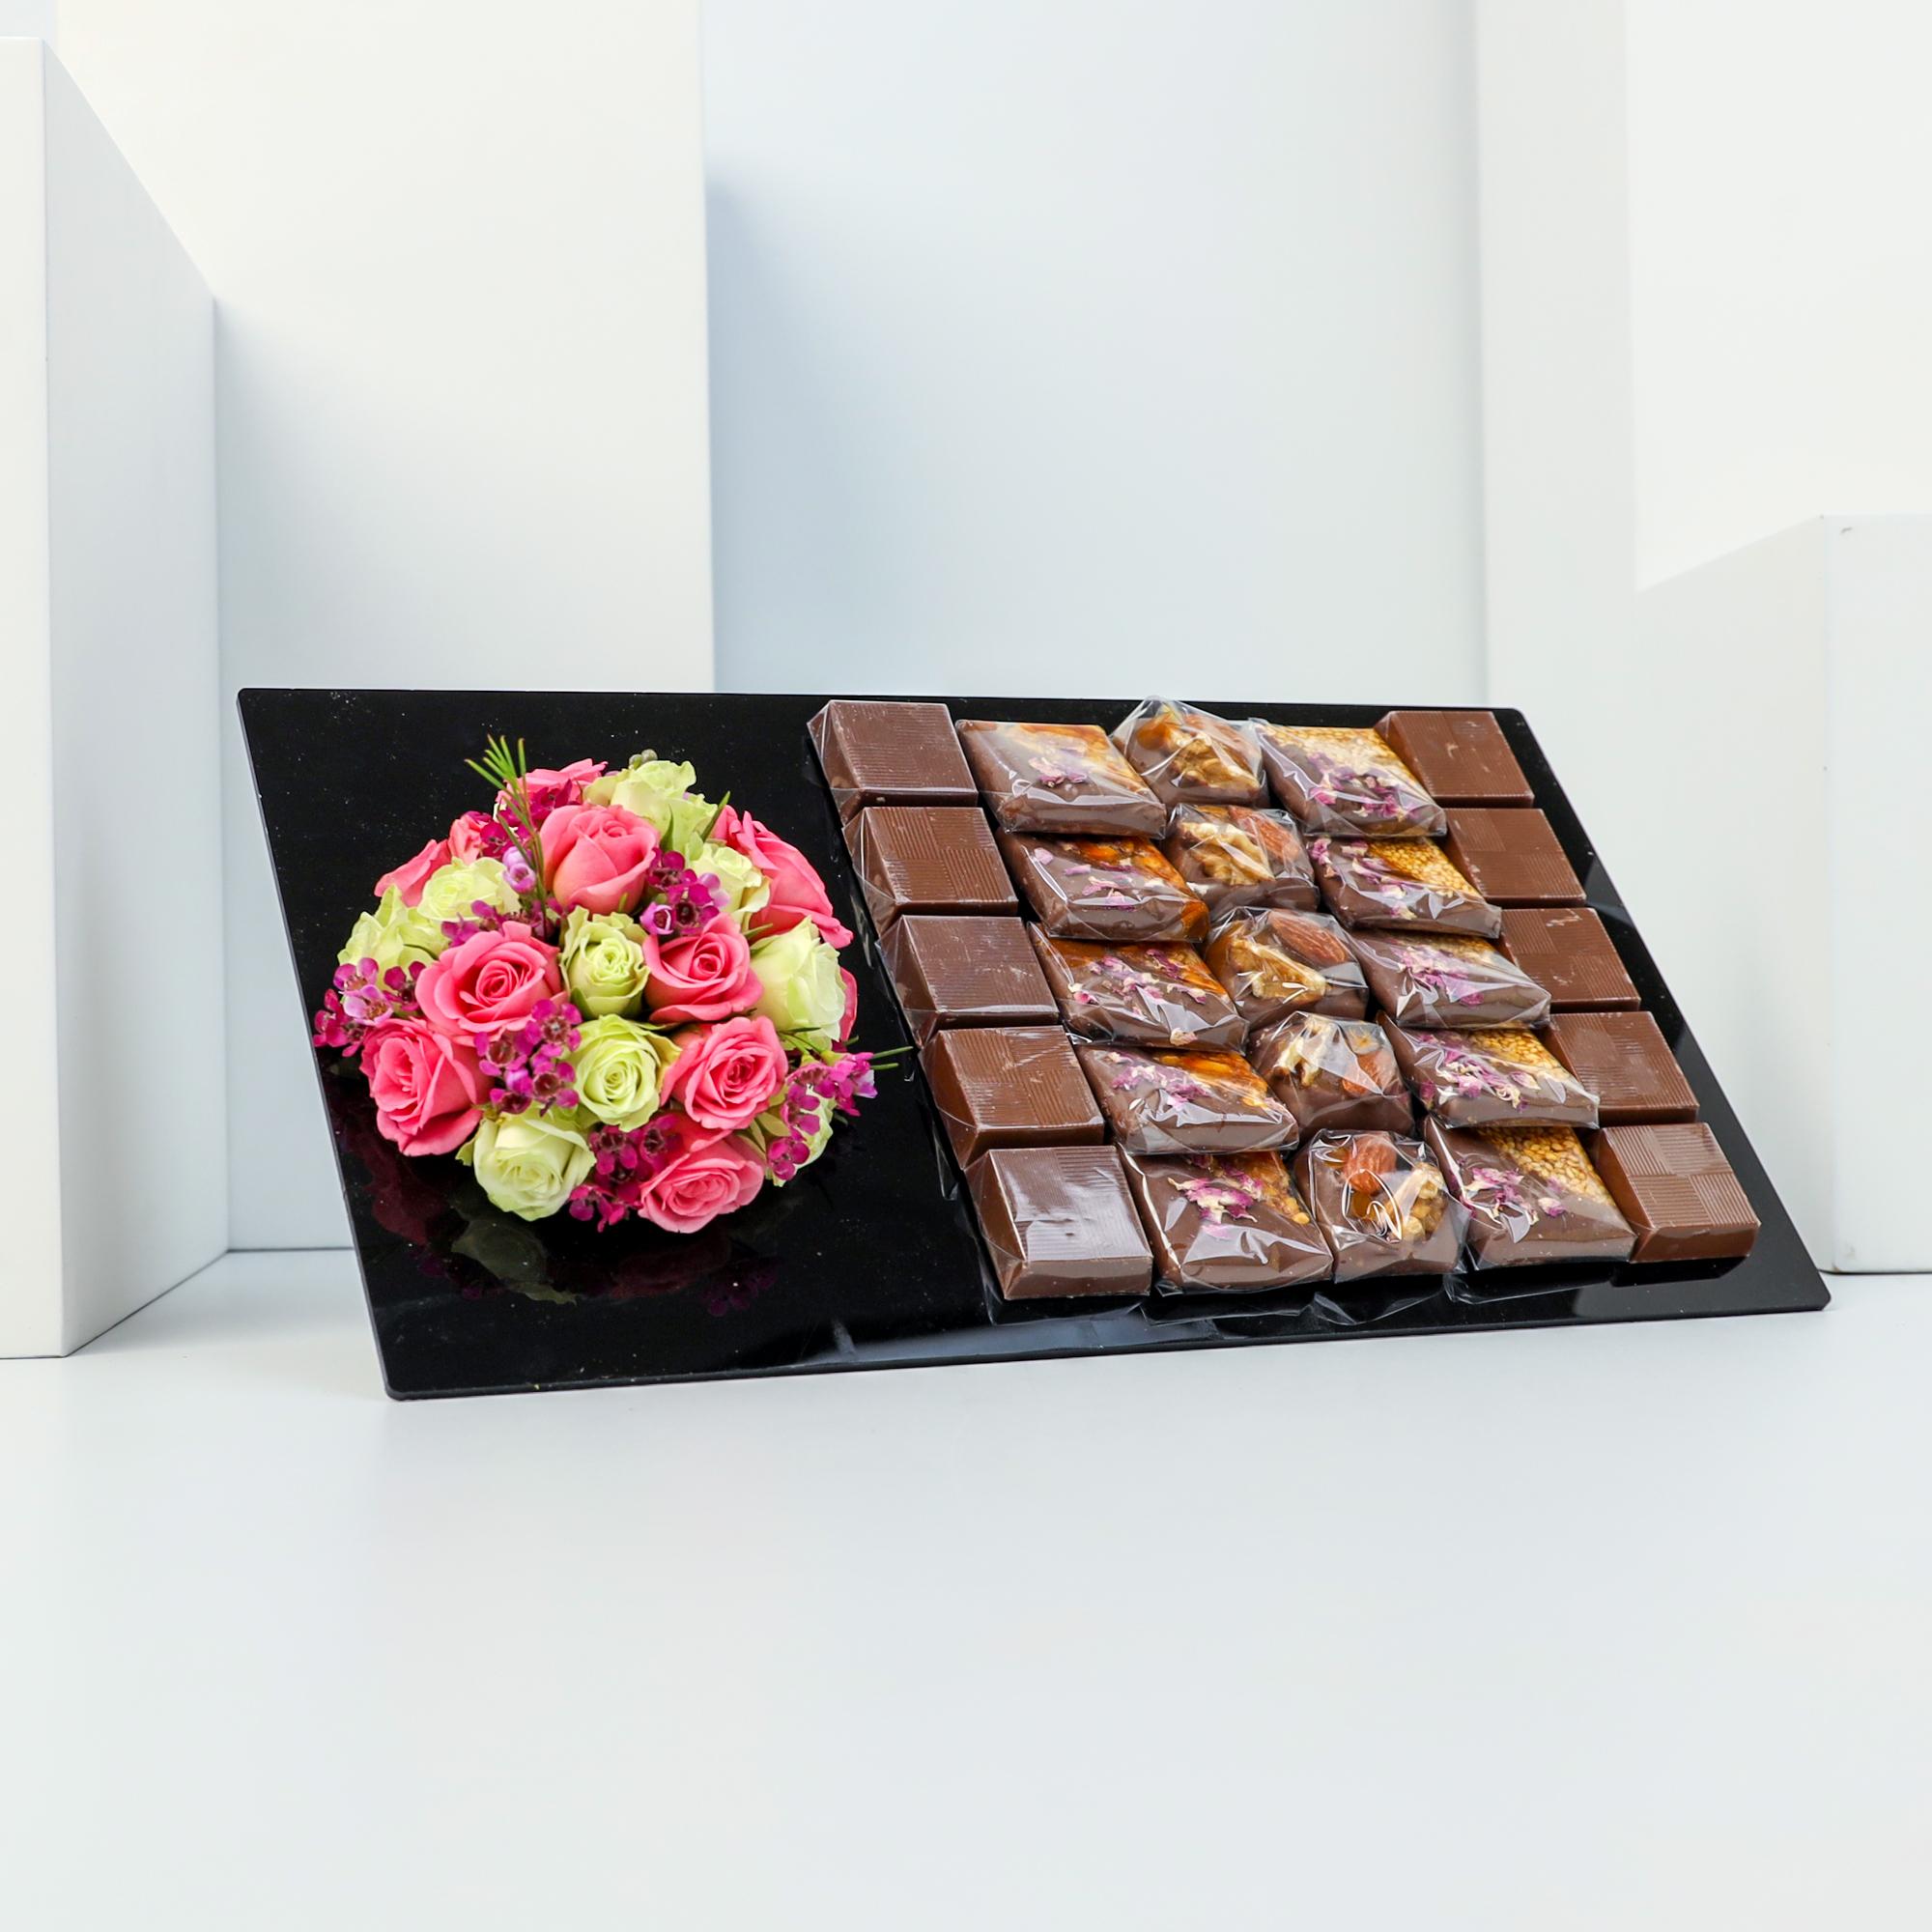 Mix Chocolate Tray